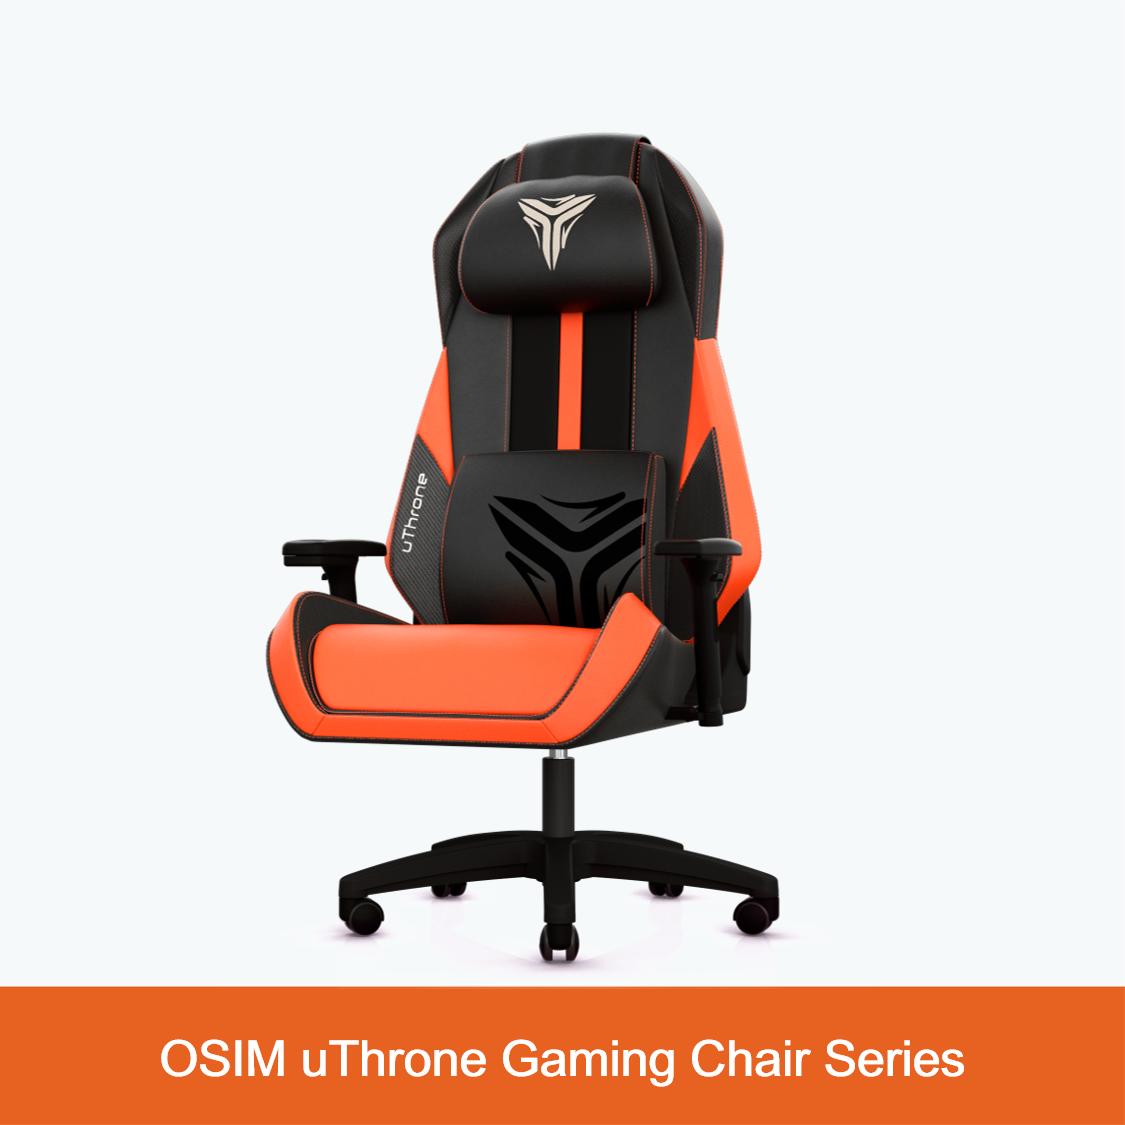 osim gaming chair